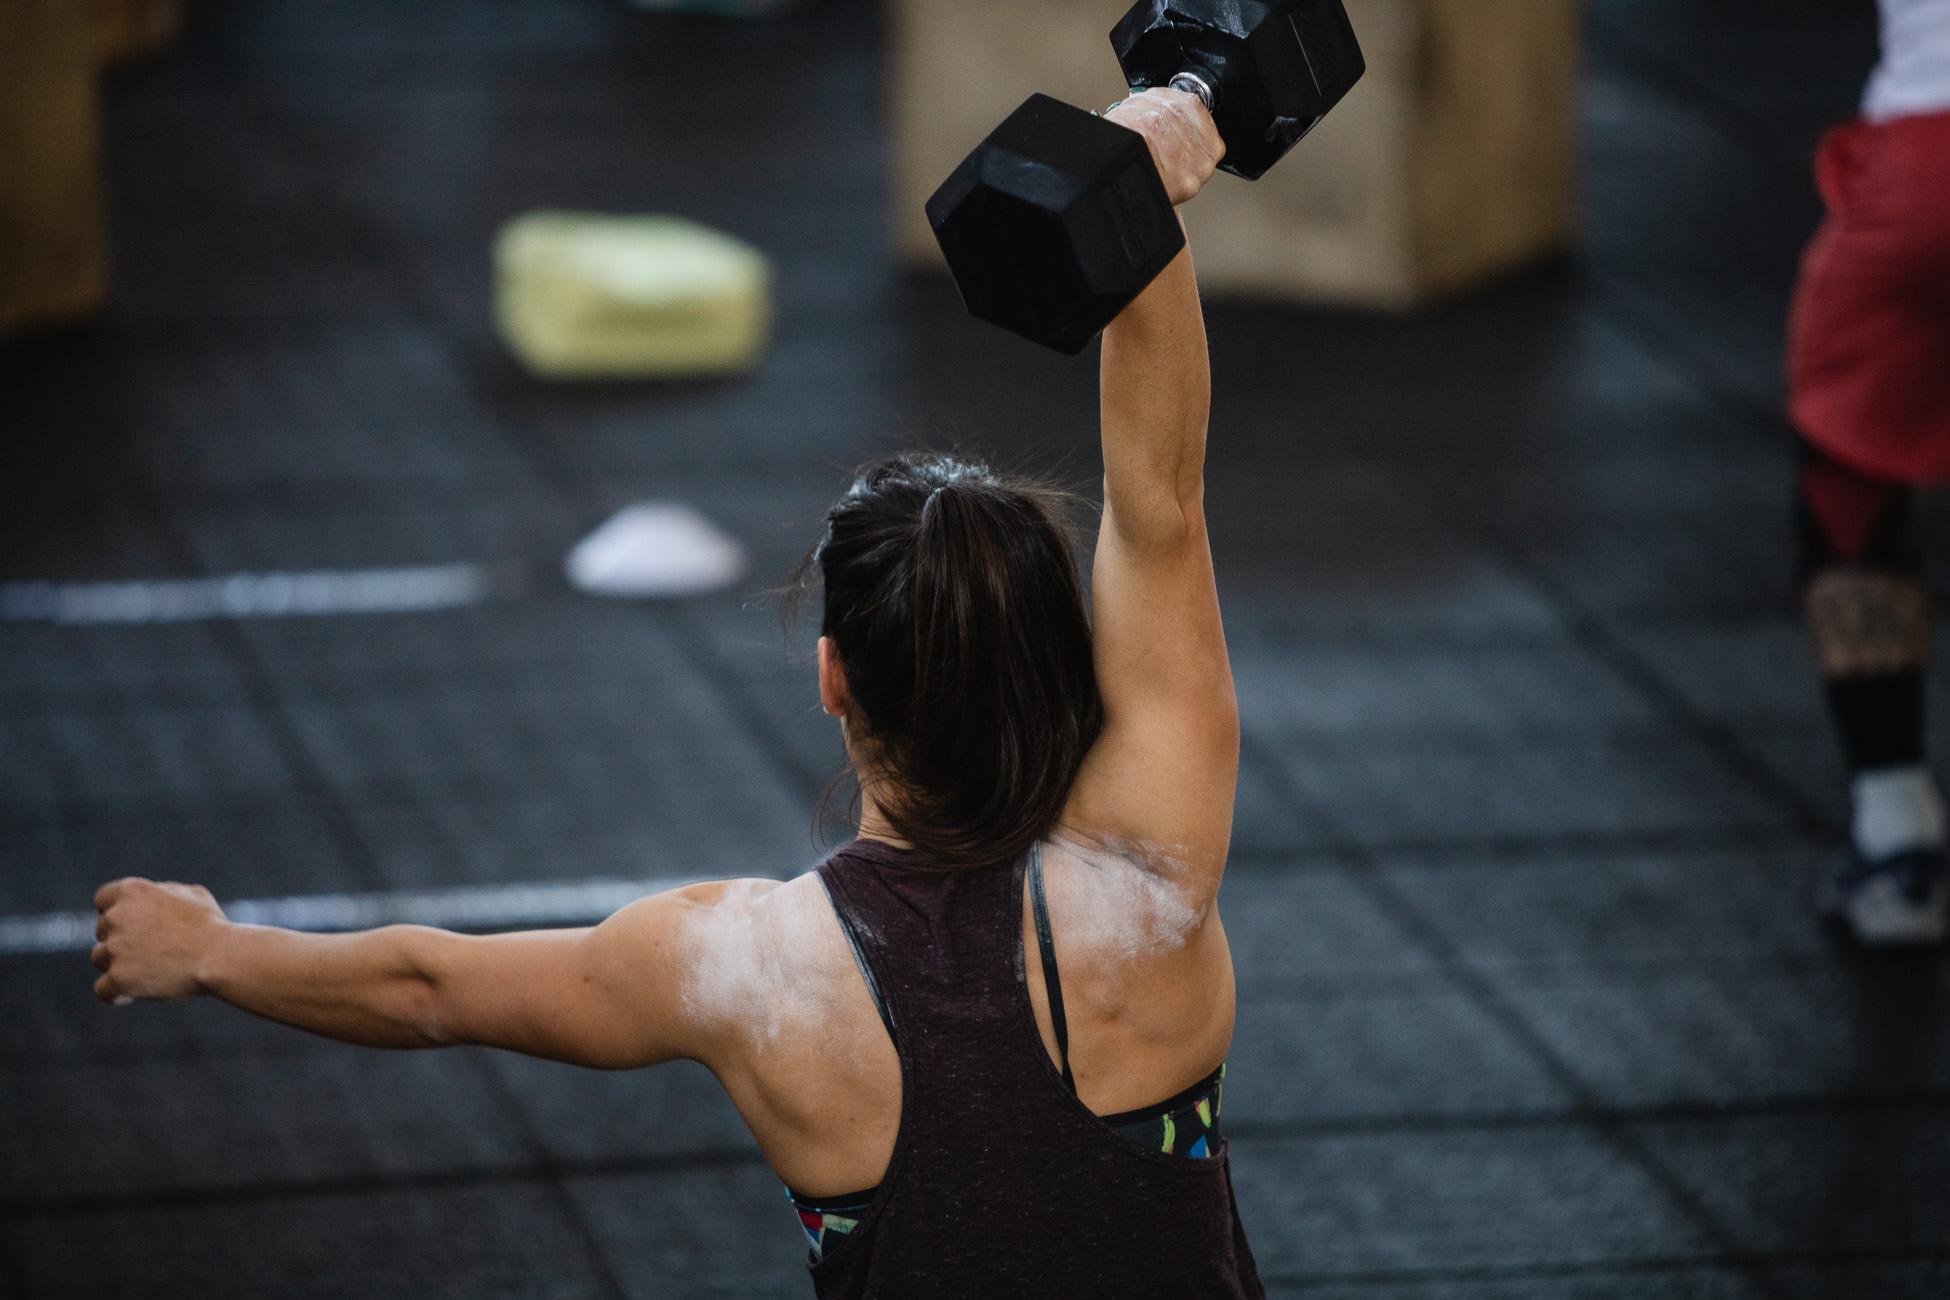 crossfit-games-open-fitness-lifestyle-desporto-atleta-fotografia-003.jpg